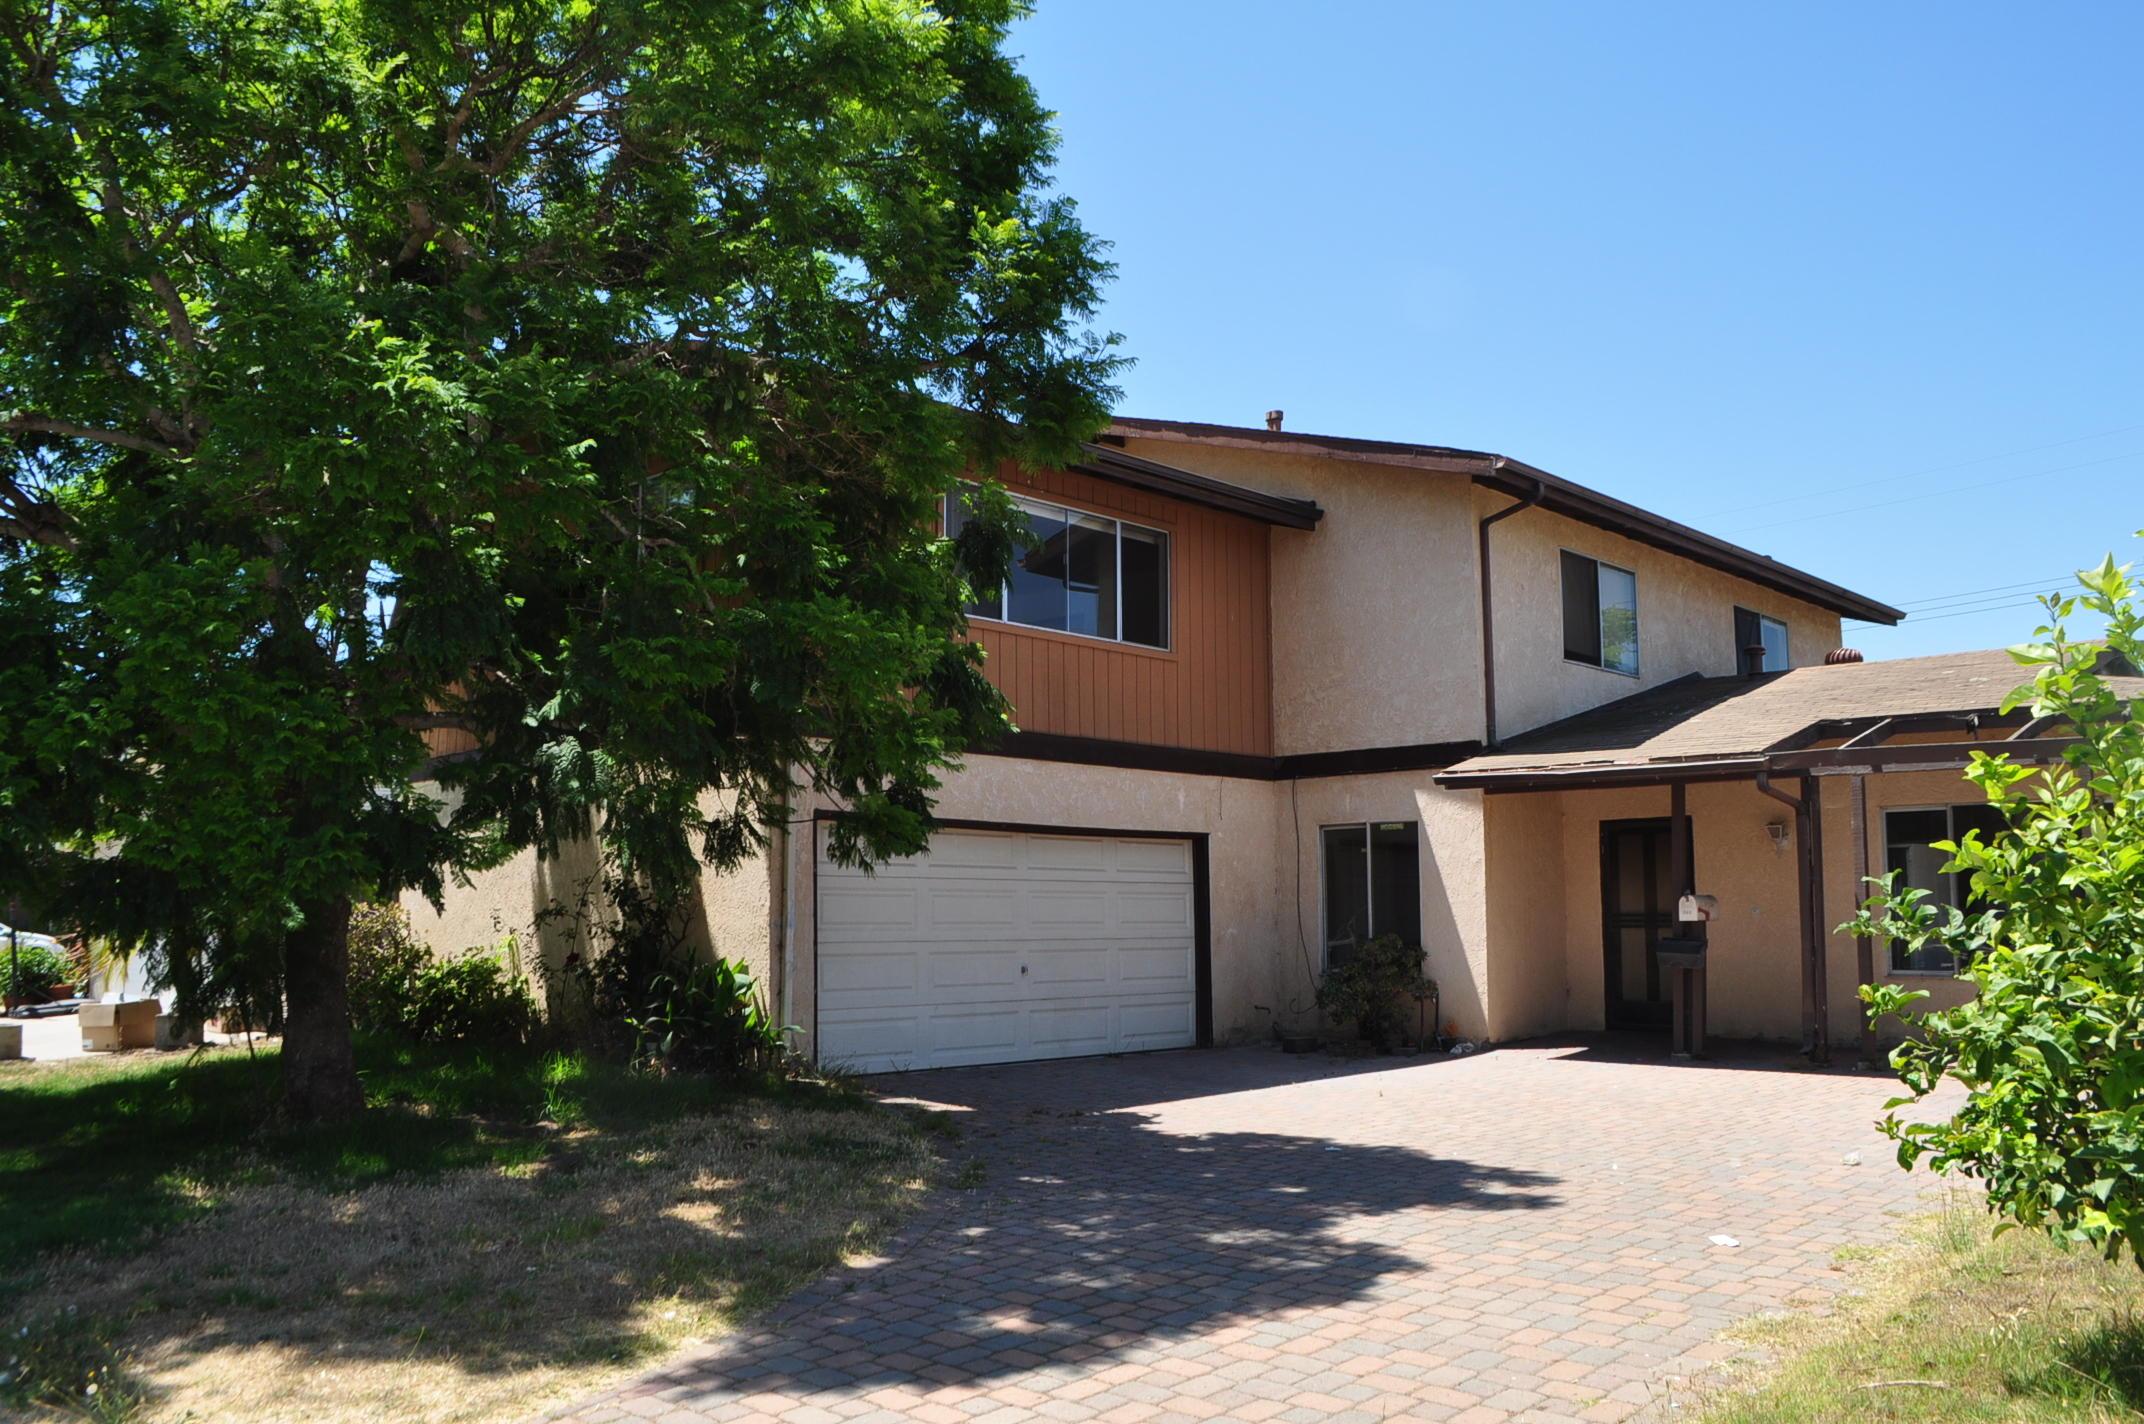 Property photo for 581 Ripley St Santa Barbara, California 93111 - 18-3014